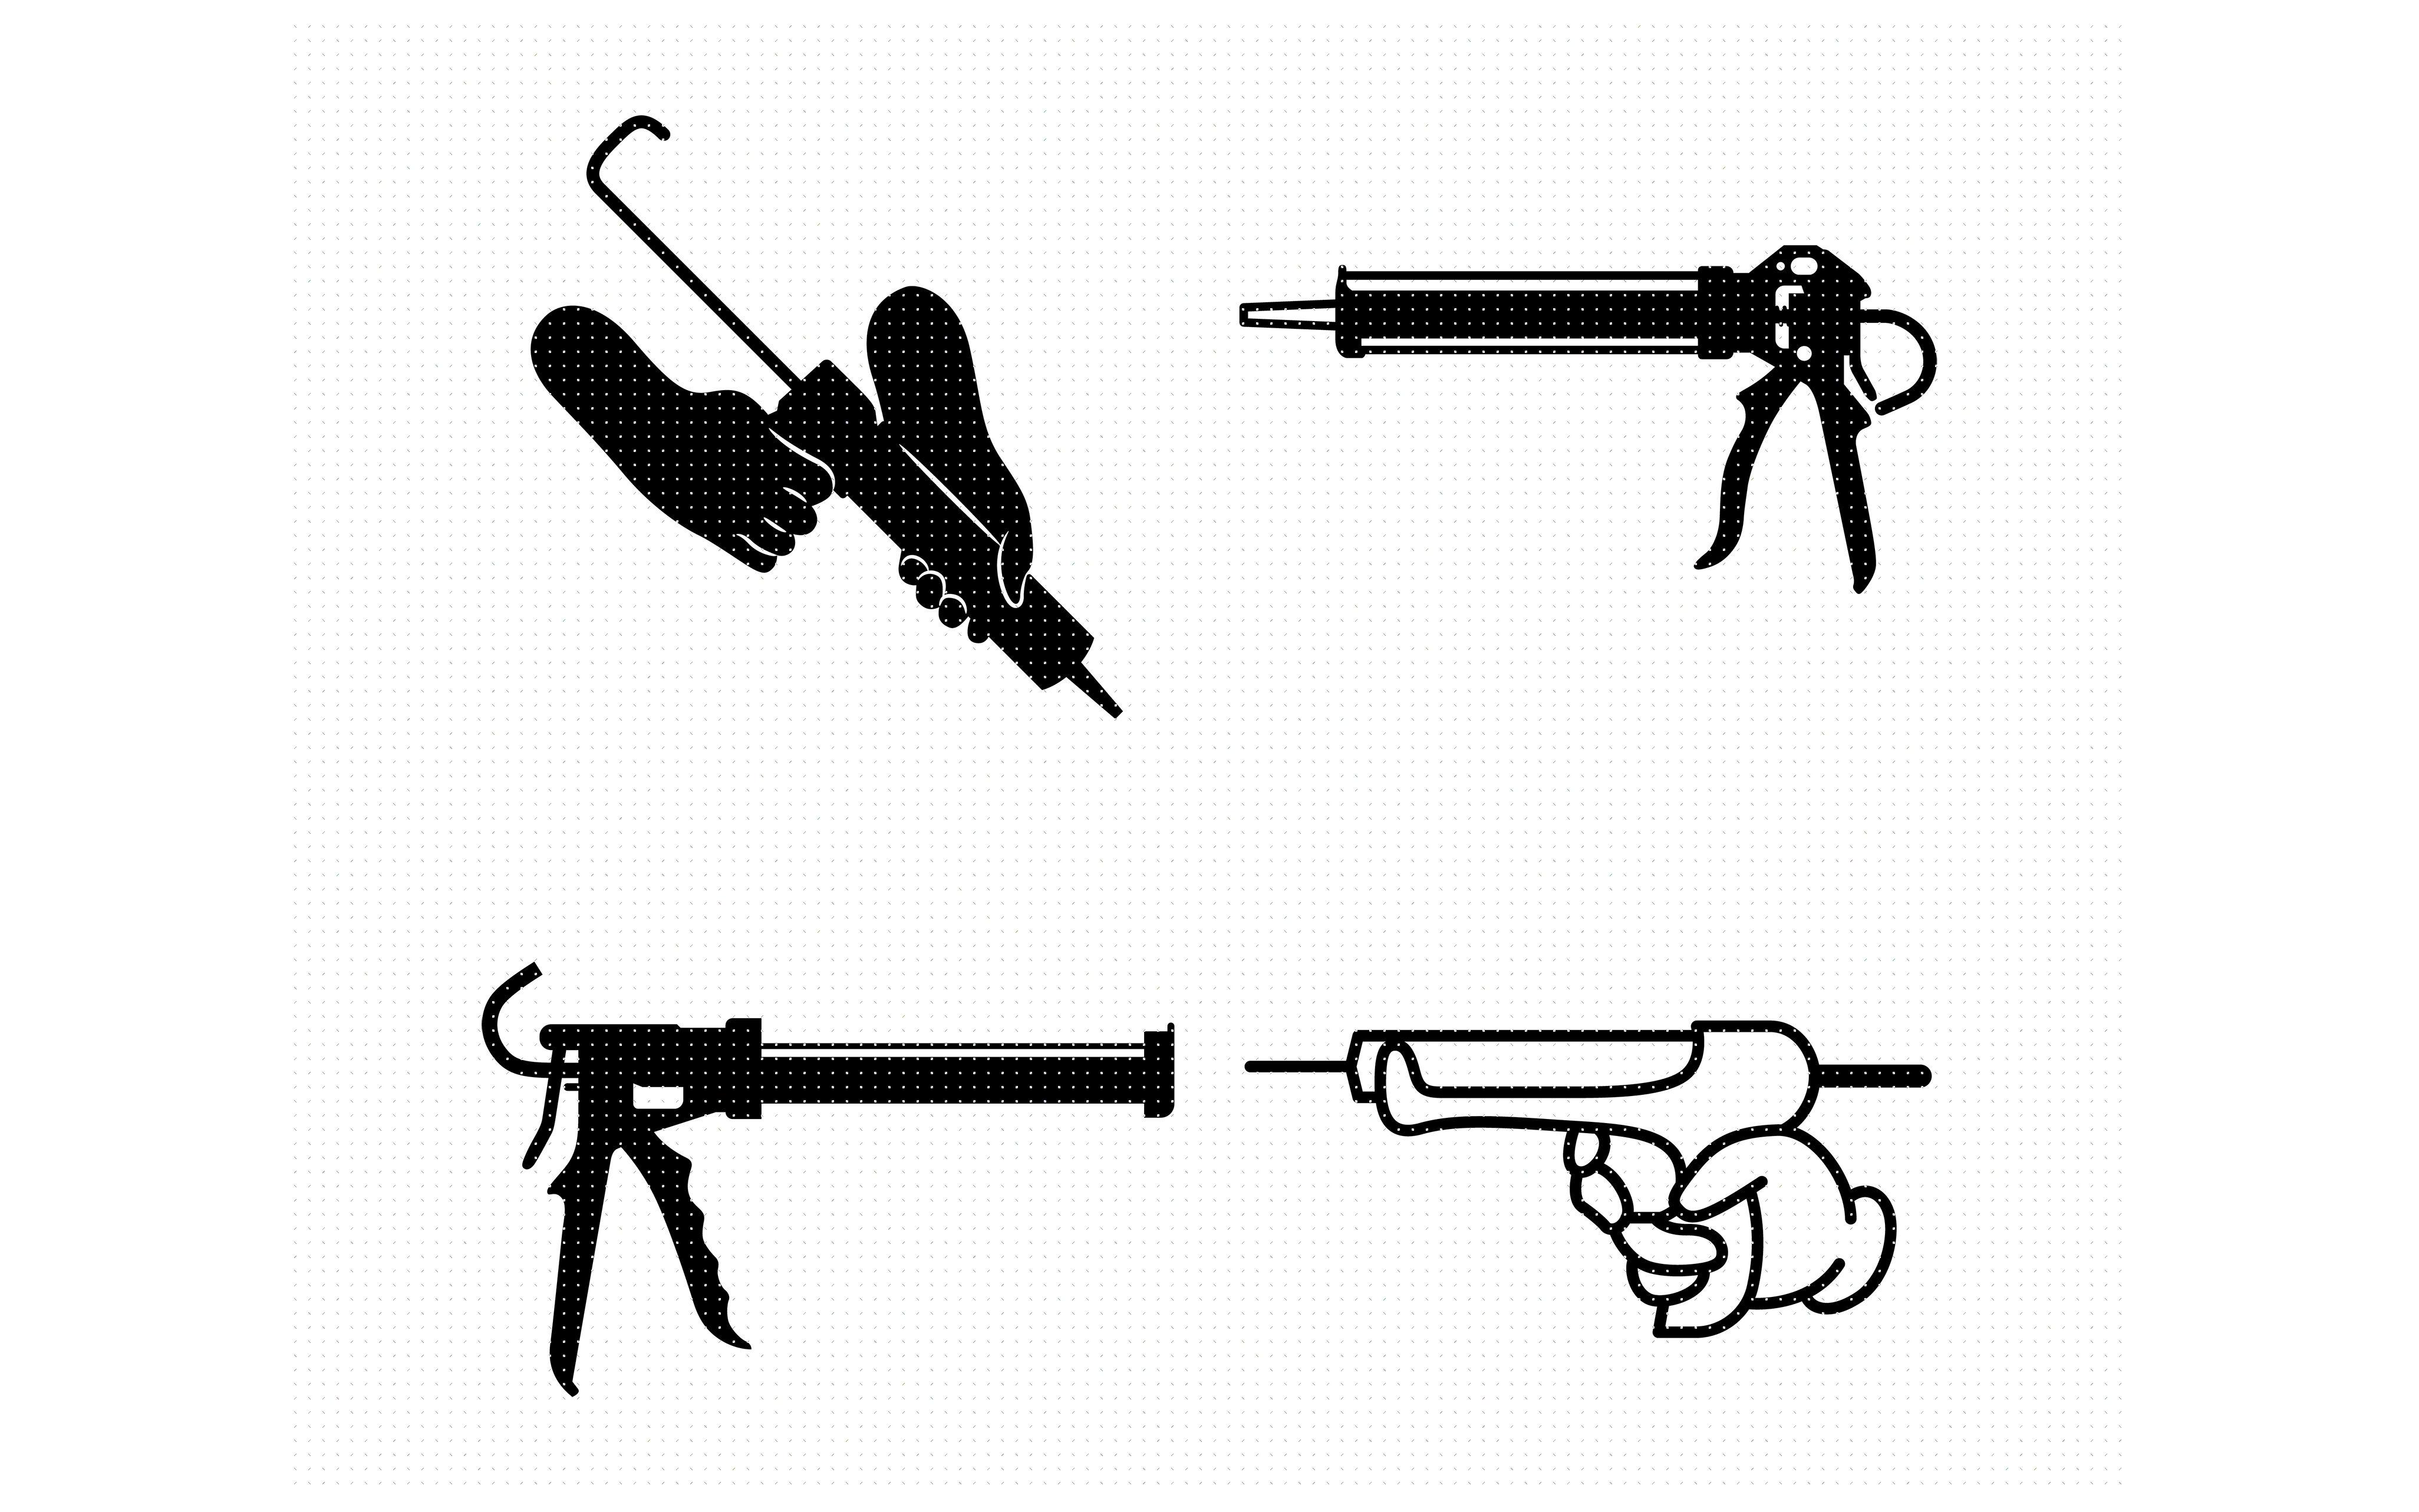 Caulk Gun Caulking Adhesive Svg Dxf Vector Eps Clipart